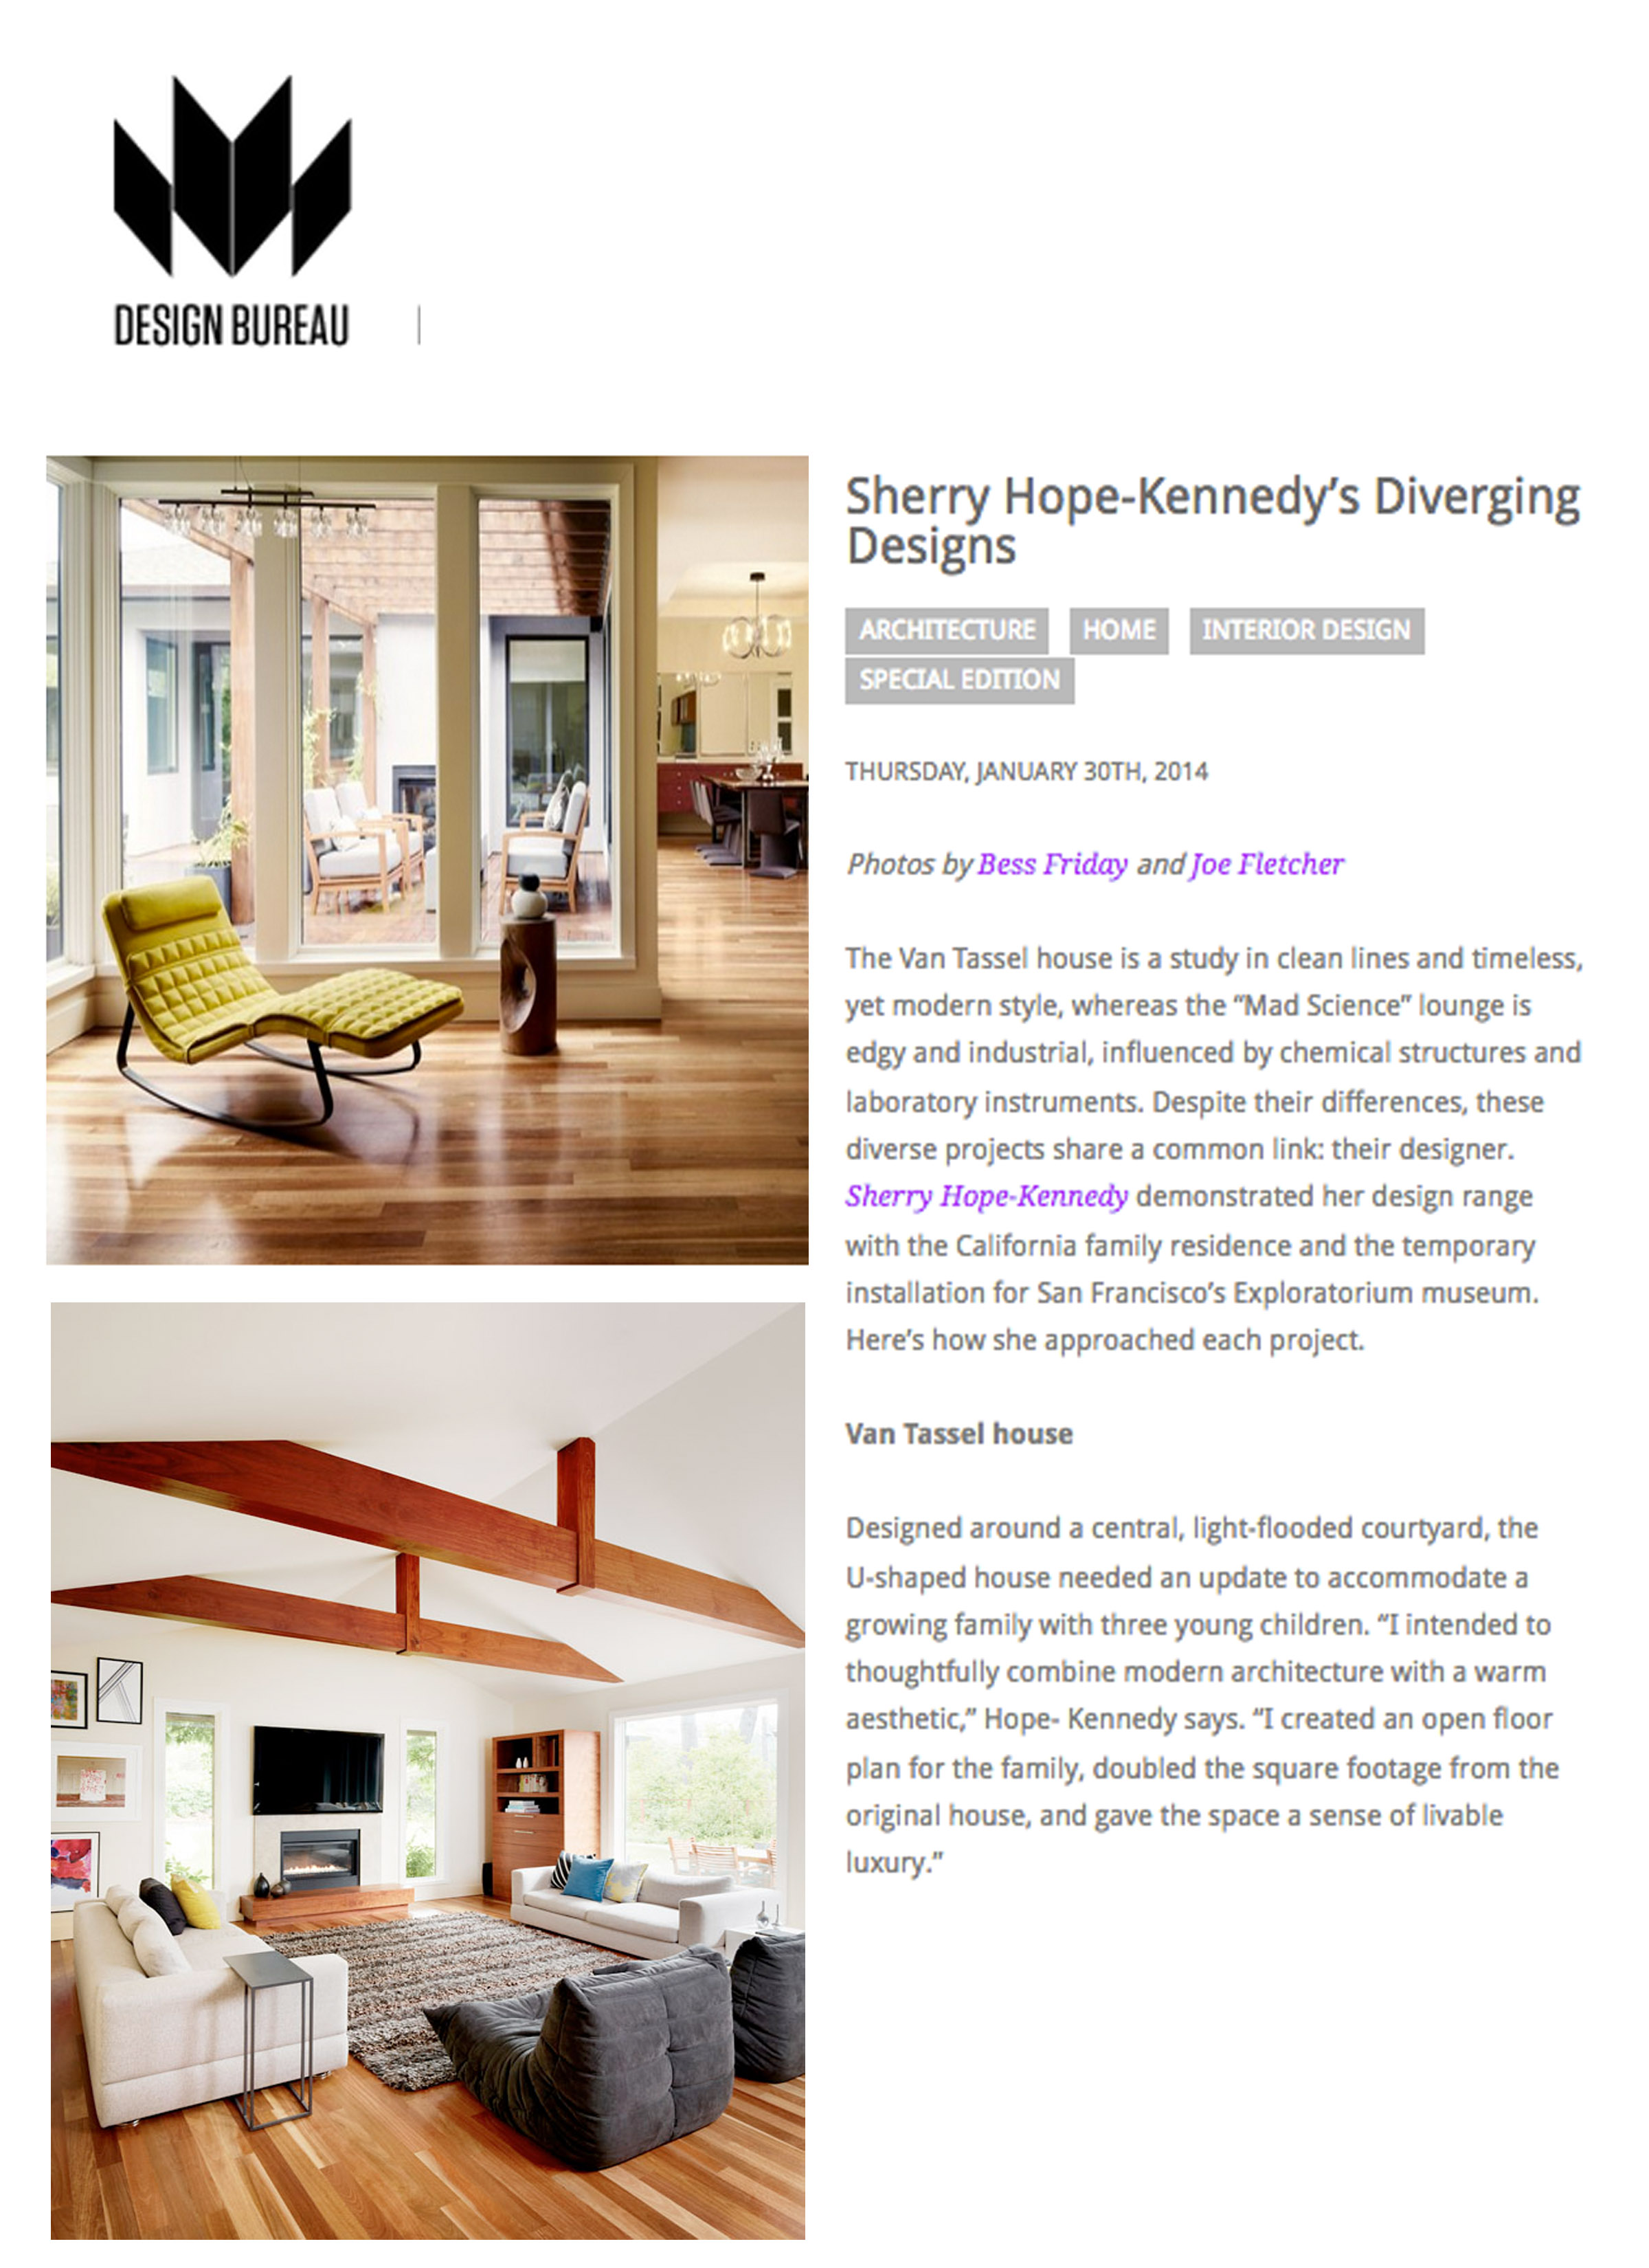 Design Bureau - Studio SHK's Van Tassel house is featured on Design Bureau. Link: http://bit.ly/2qXC1Xw